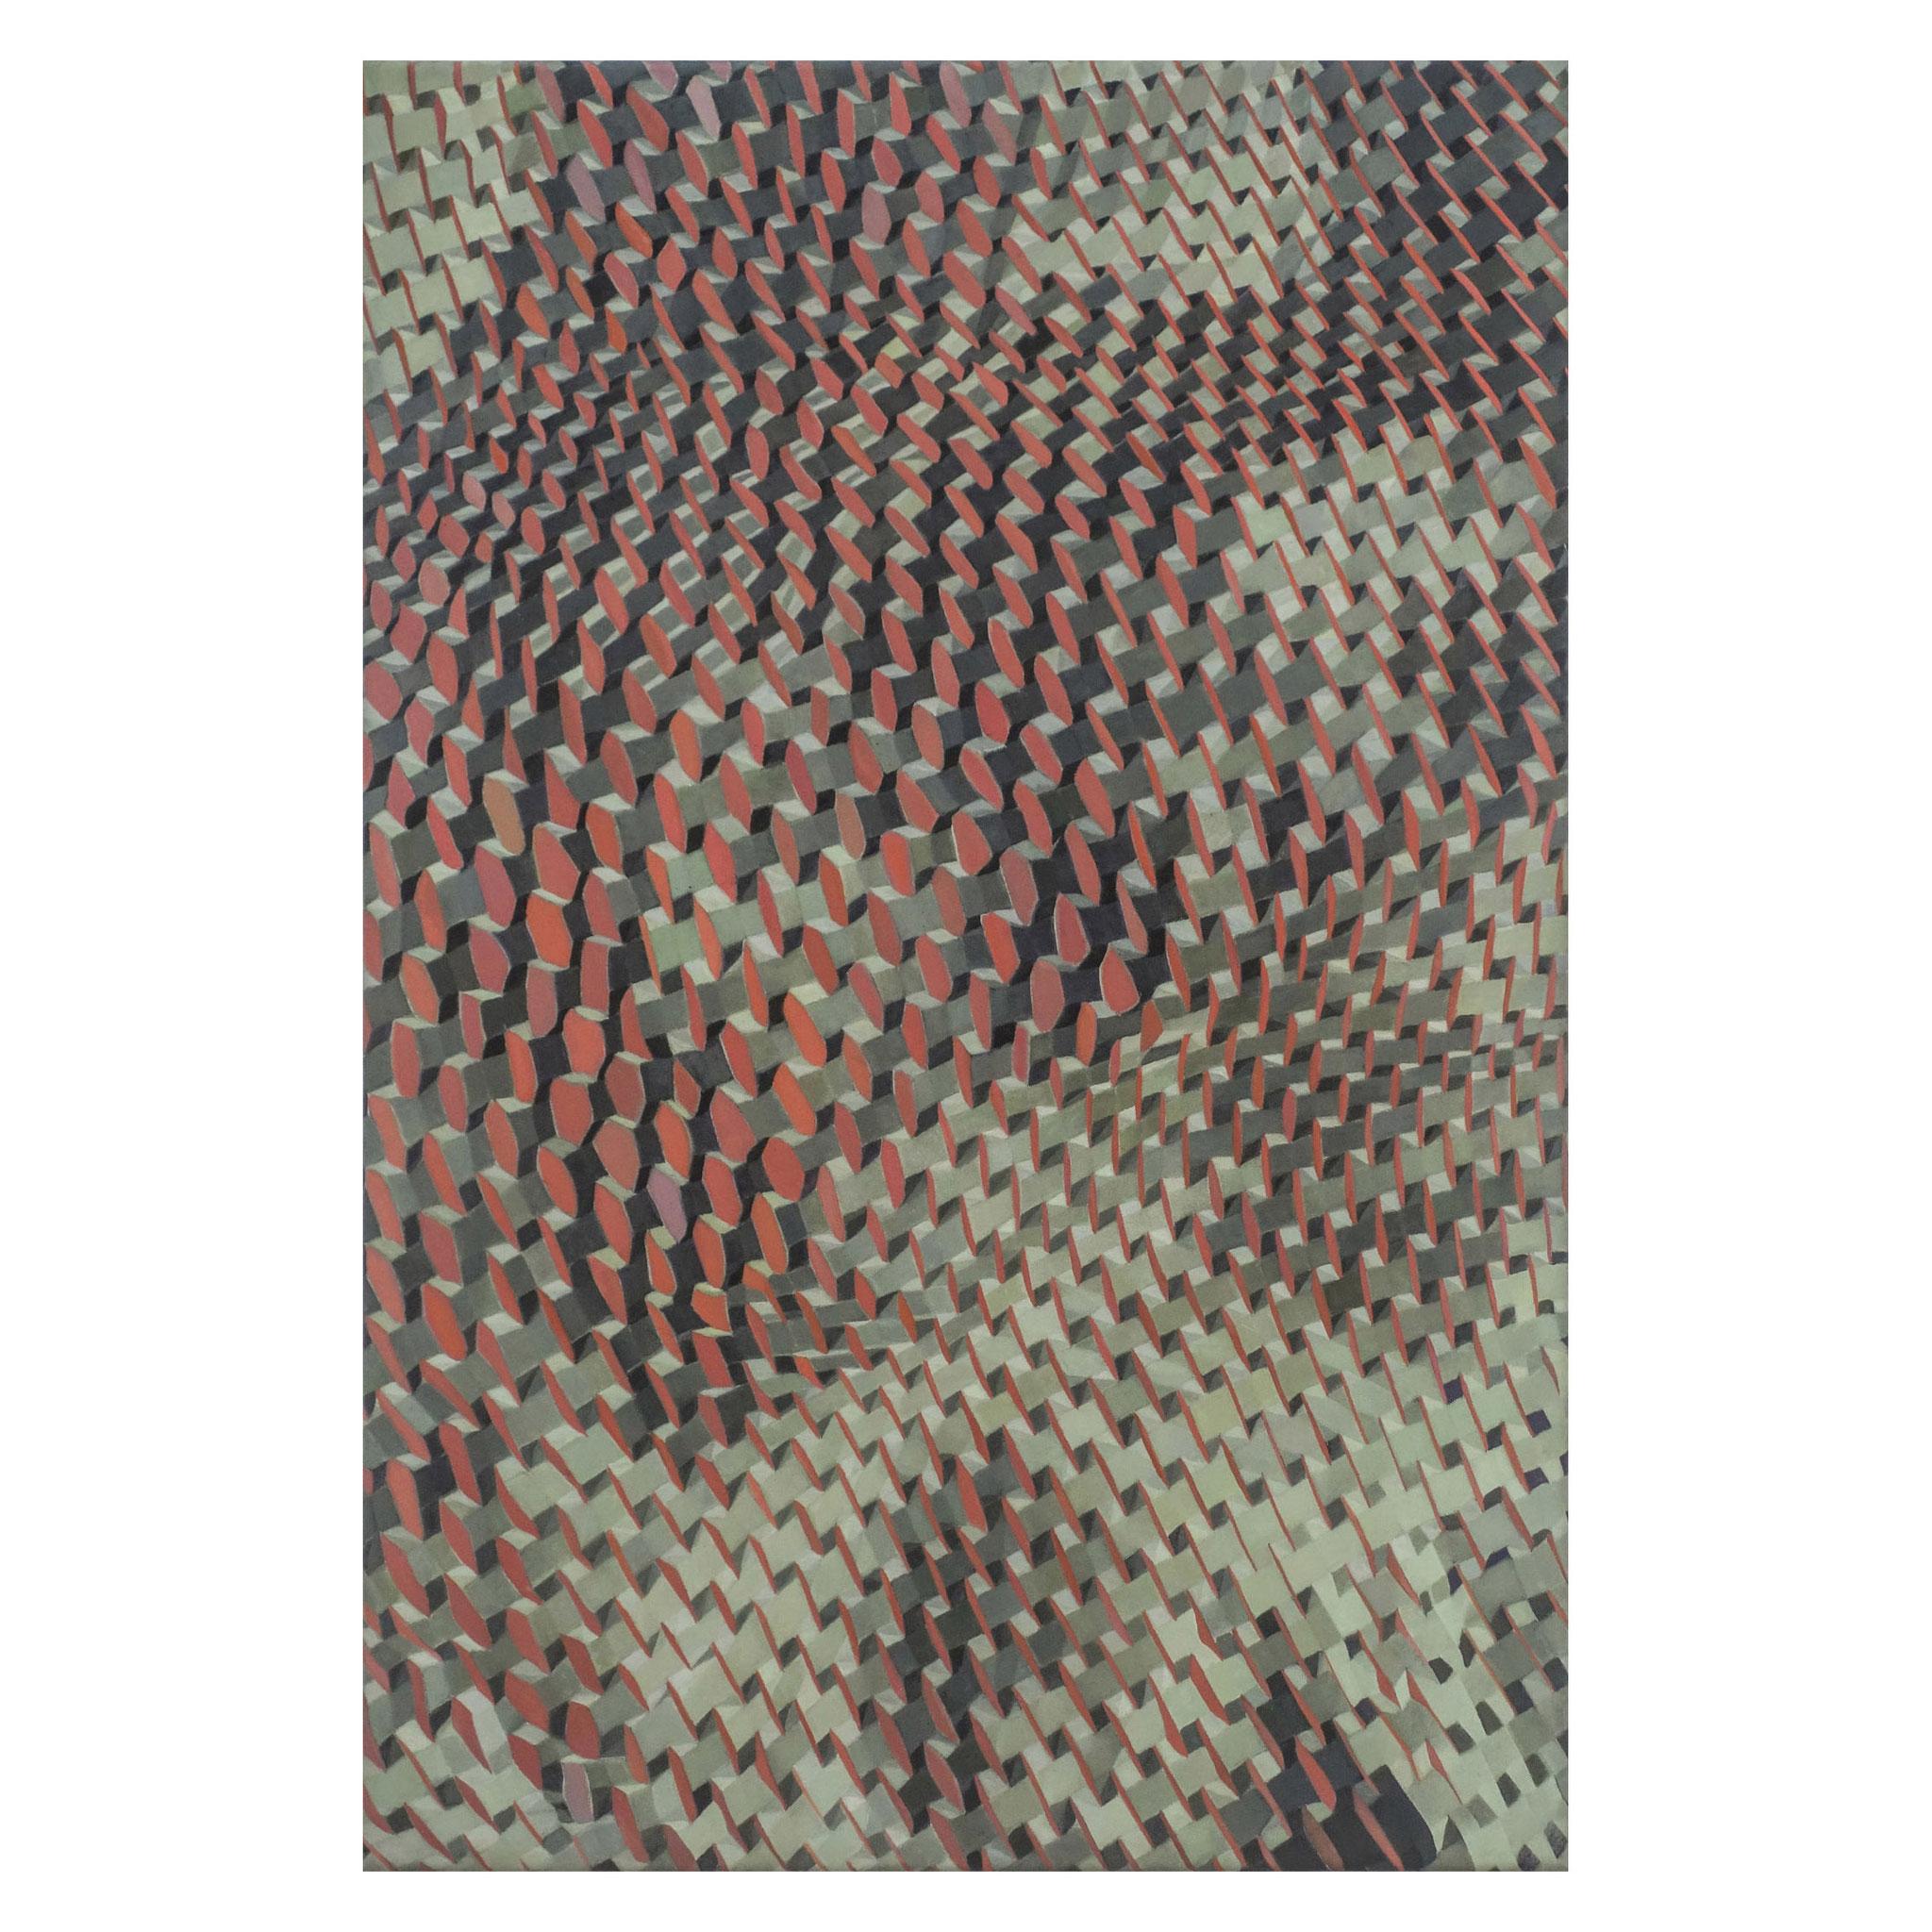 "Beate Selzer, ""UPCYCLING 4"", 2021, Öl auf Leinwand,  75 x 50 auf 18 cm"